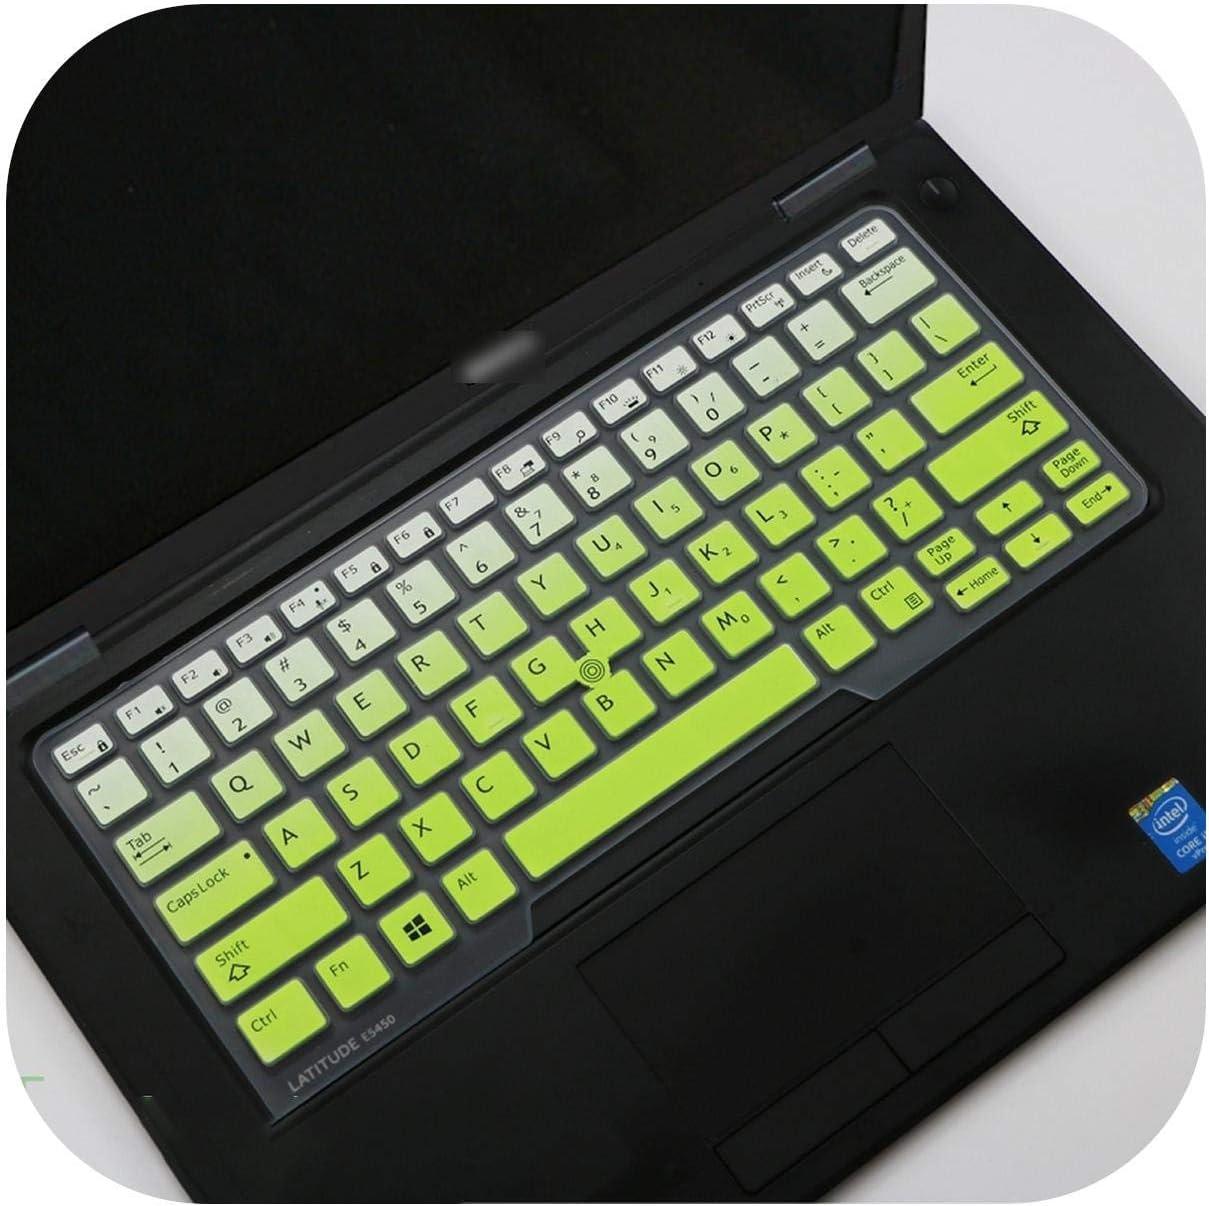 Silicone Laptop Keyboard Cover Skin for Dell Latitude E5250 E 5270 E 7250 E 7270 E5280 E7275 E 7280 E7370 Xps 12 9250 12.5-Fadeblue